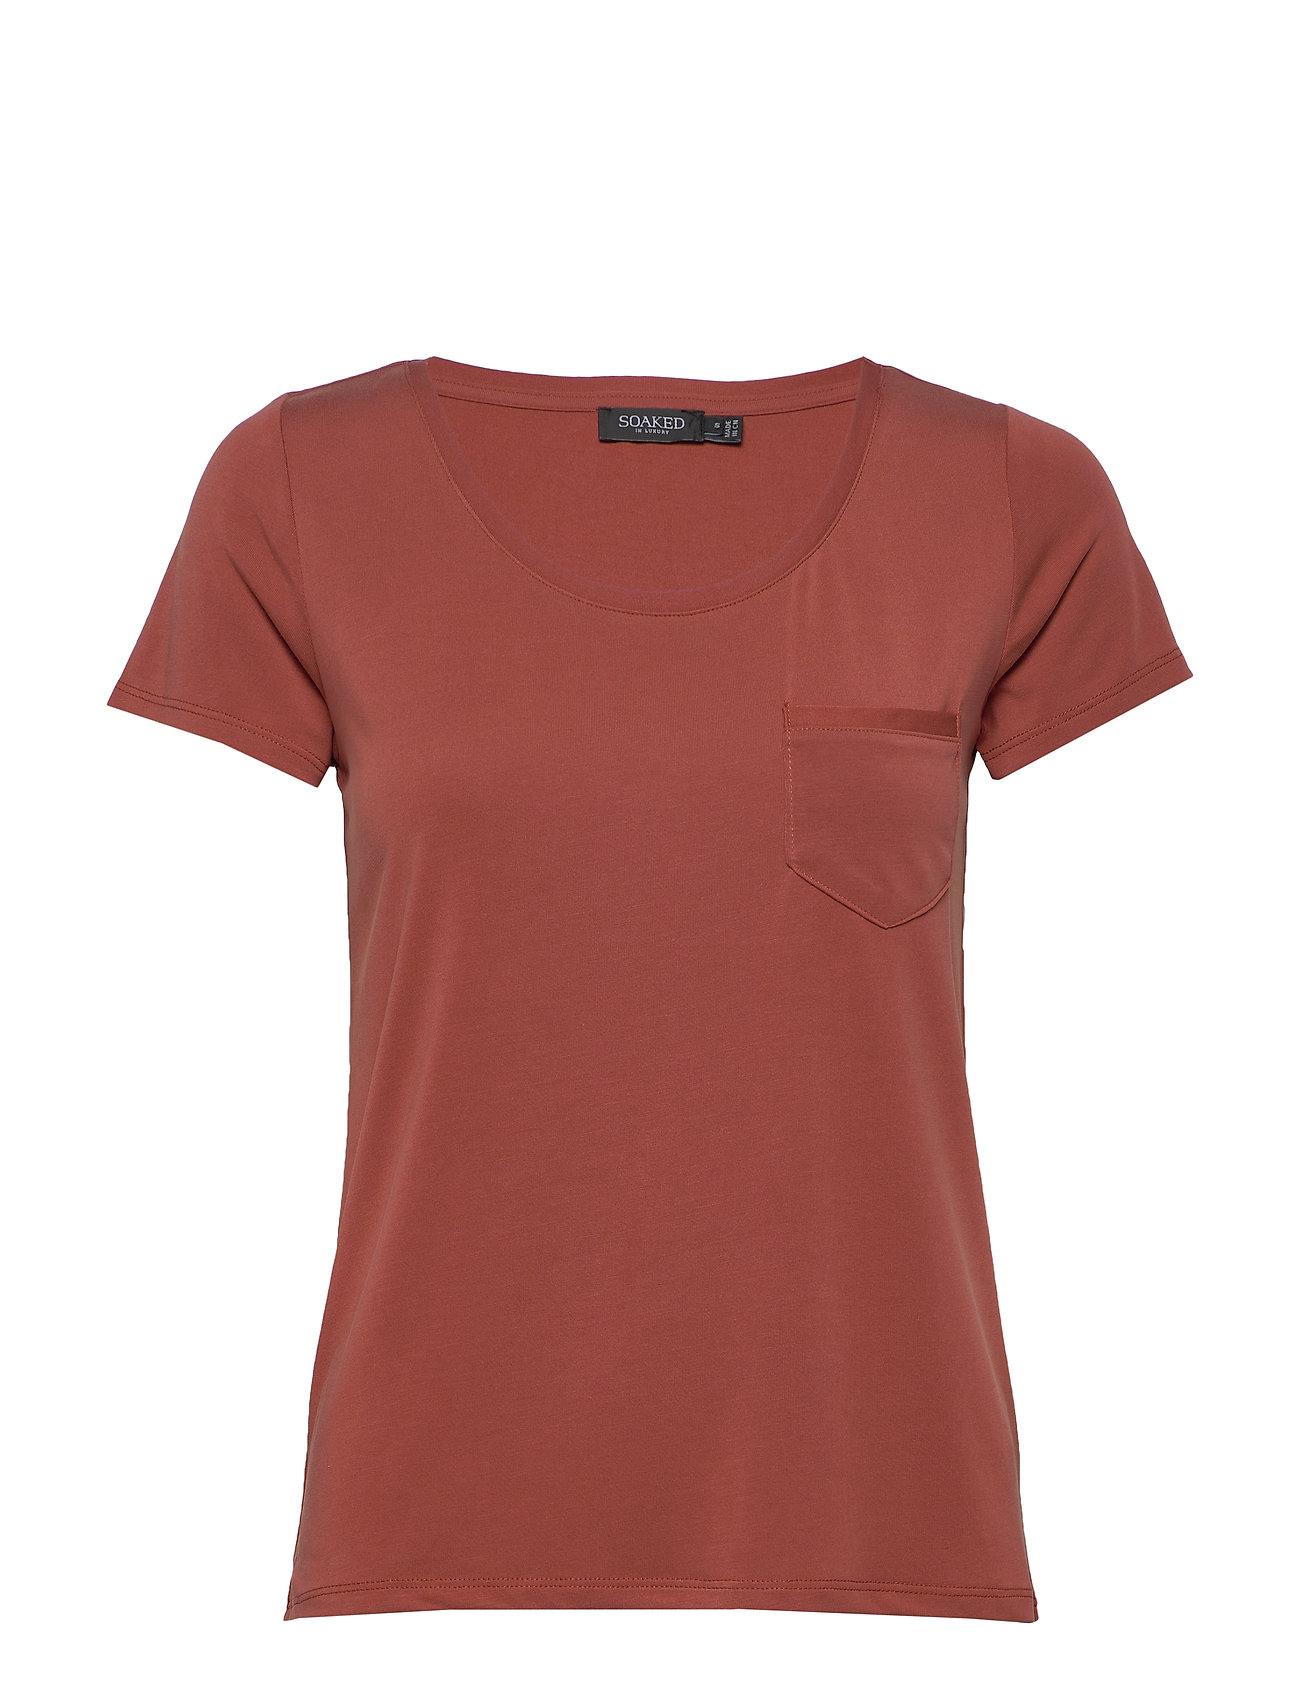 Image of Slcolumbine Tee T-shirt Top Rød Soaked In Luxury (3425609675)